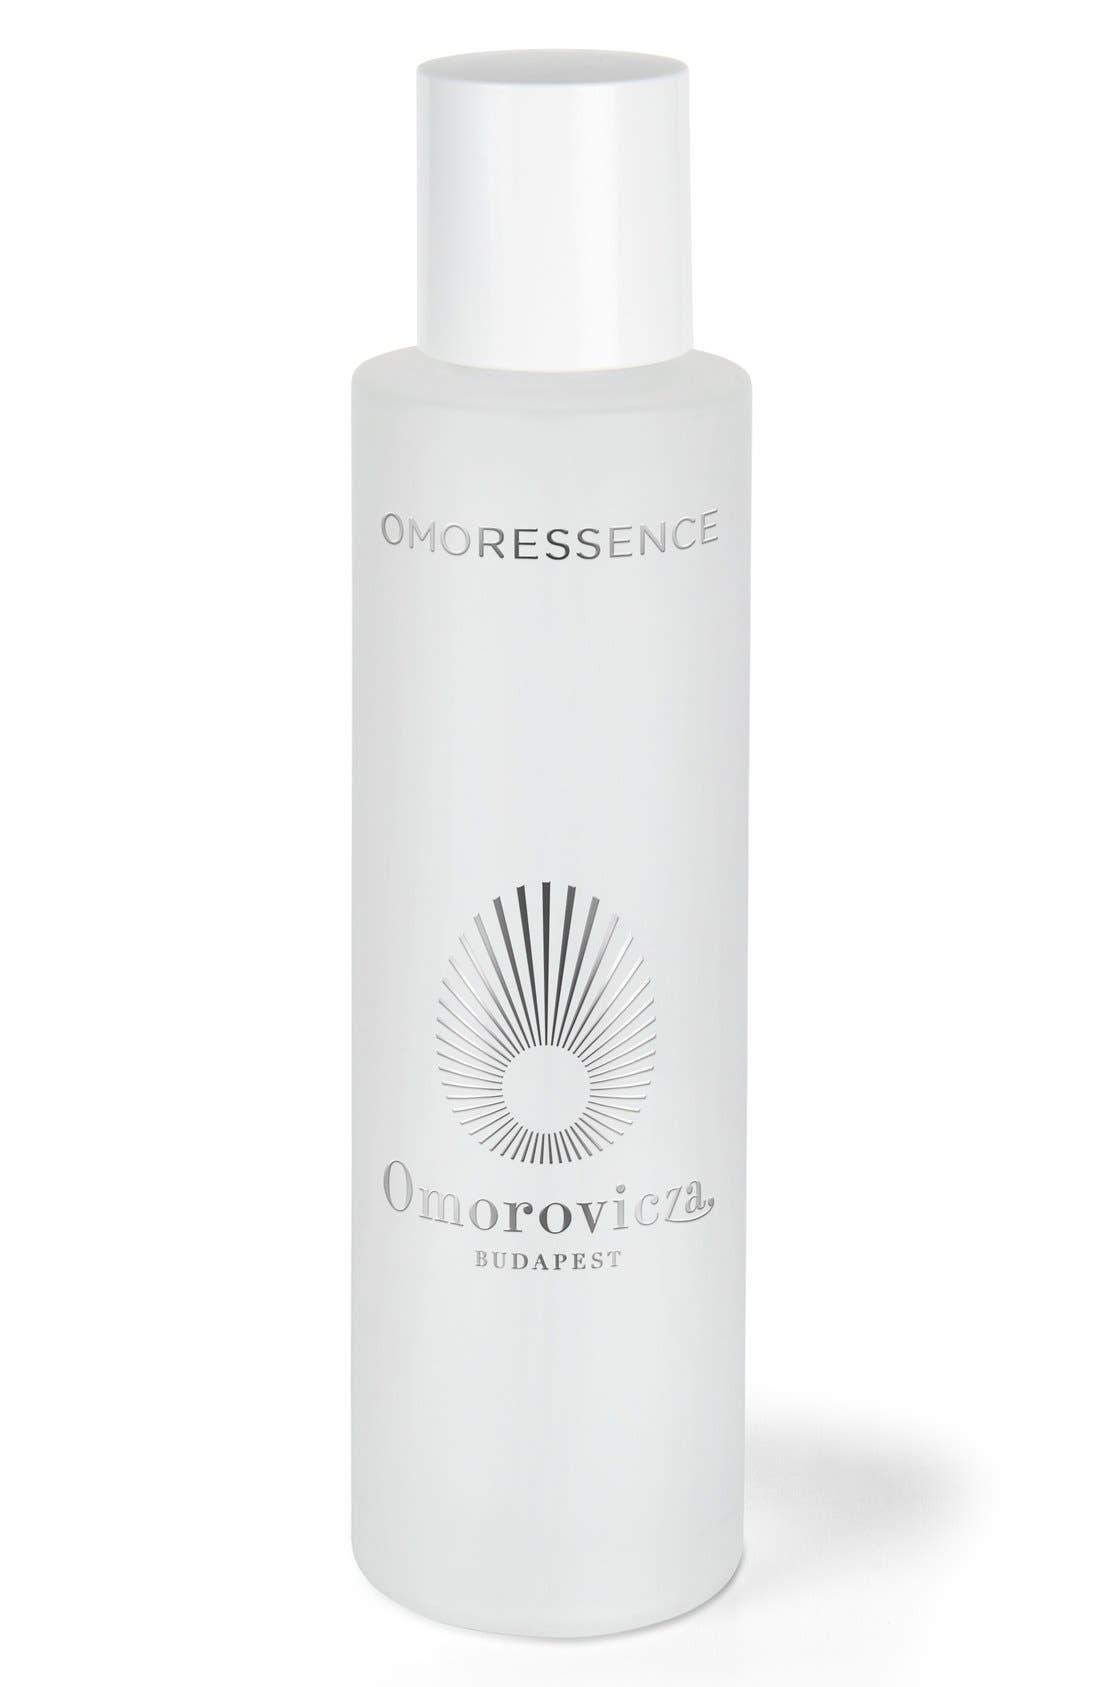 Omoressence Balancing & Hydrating Essence